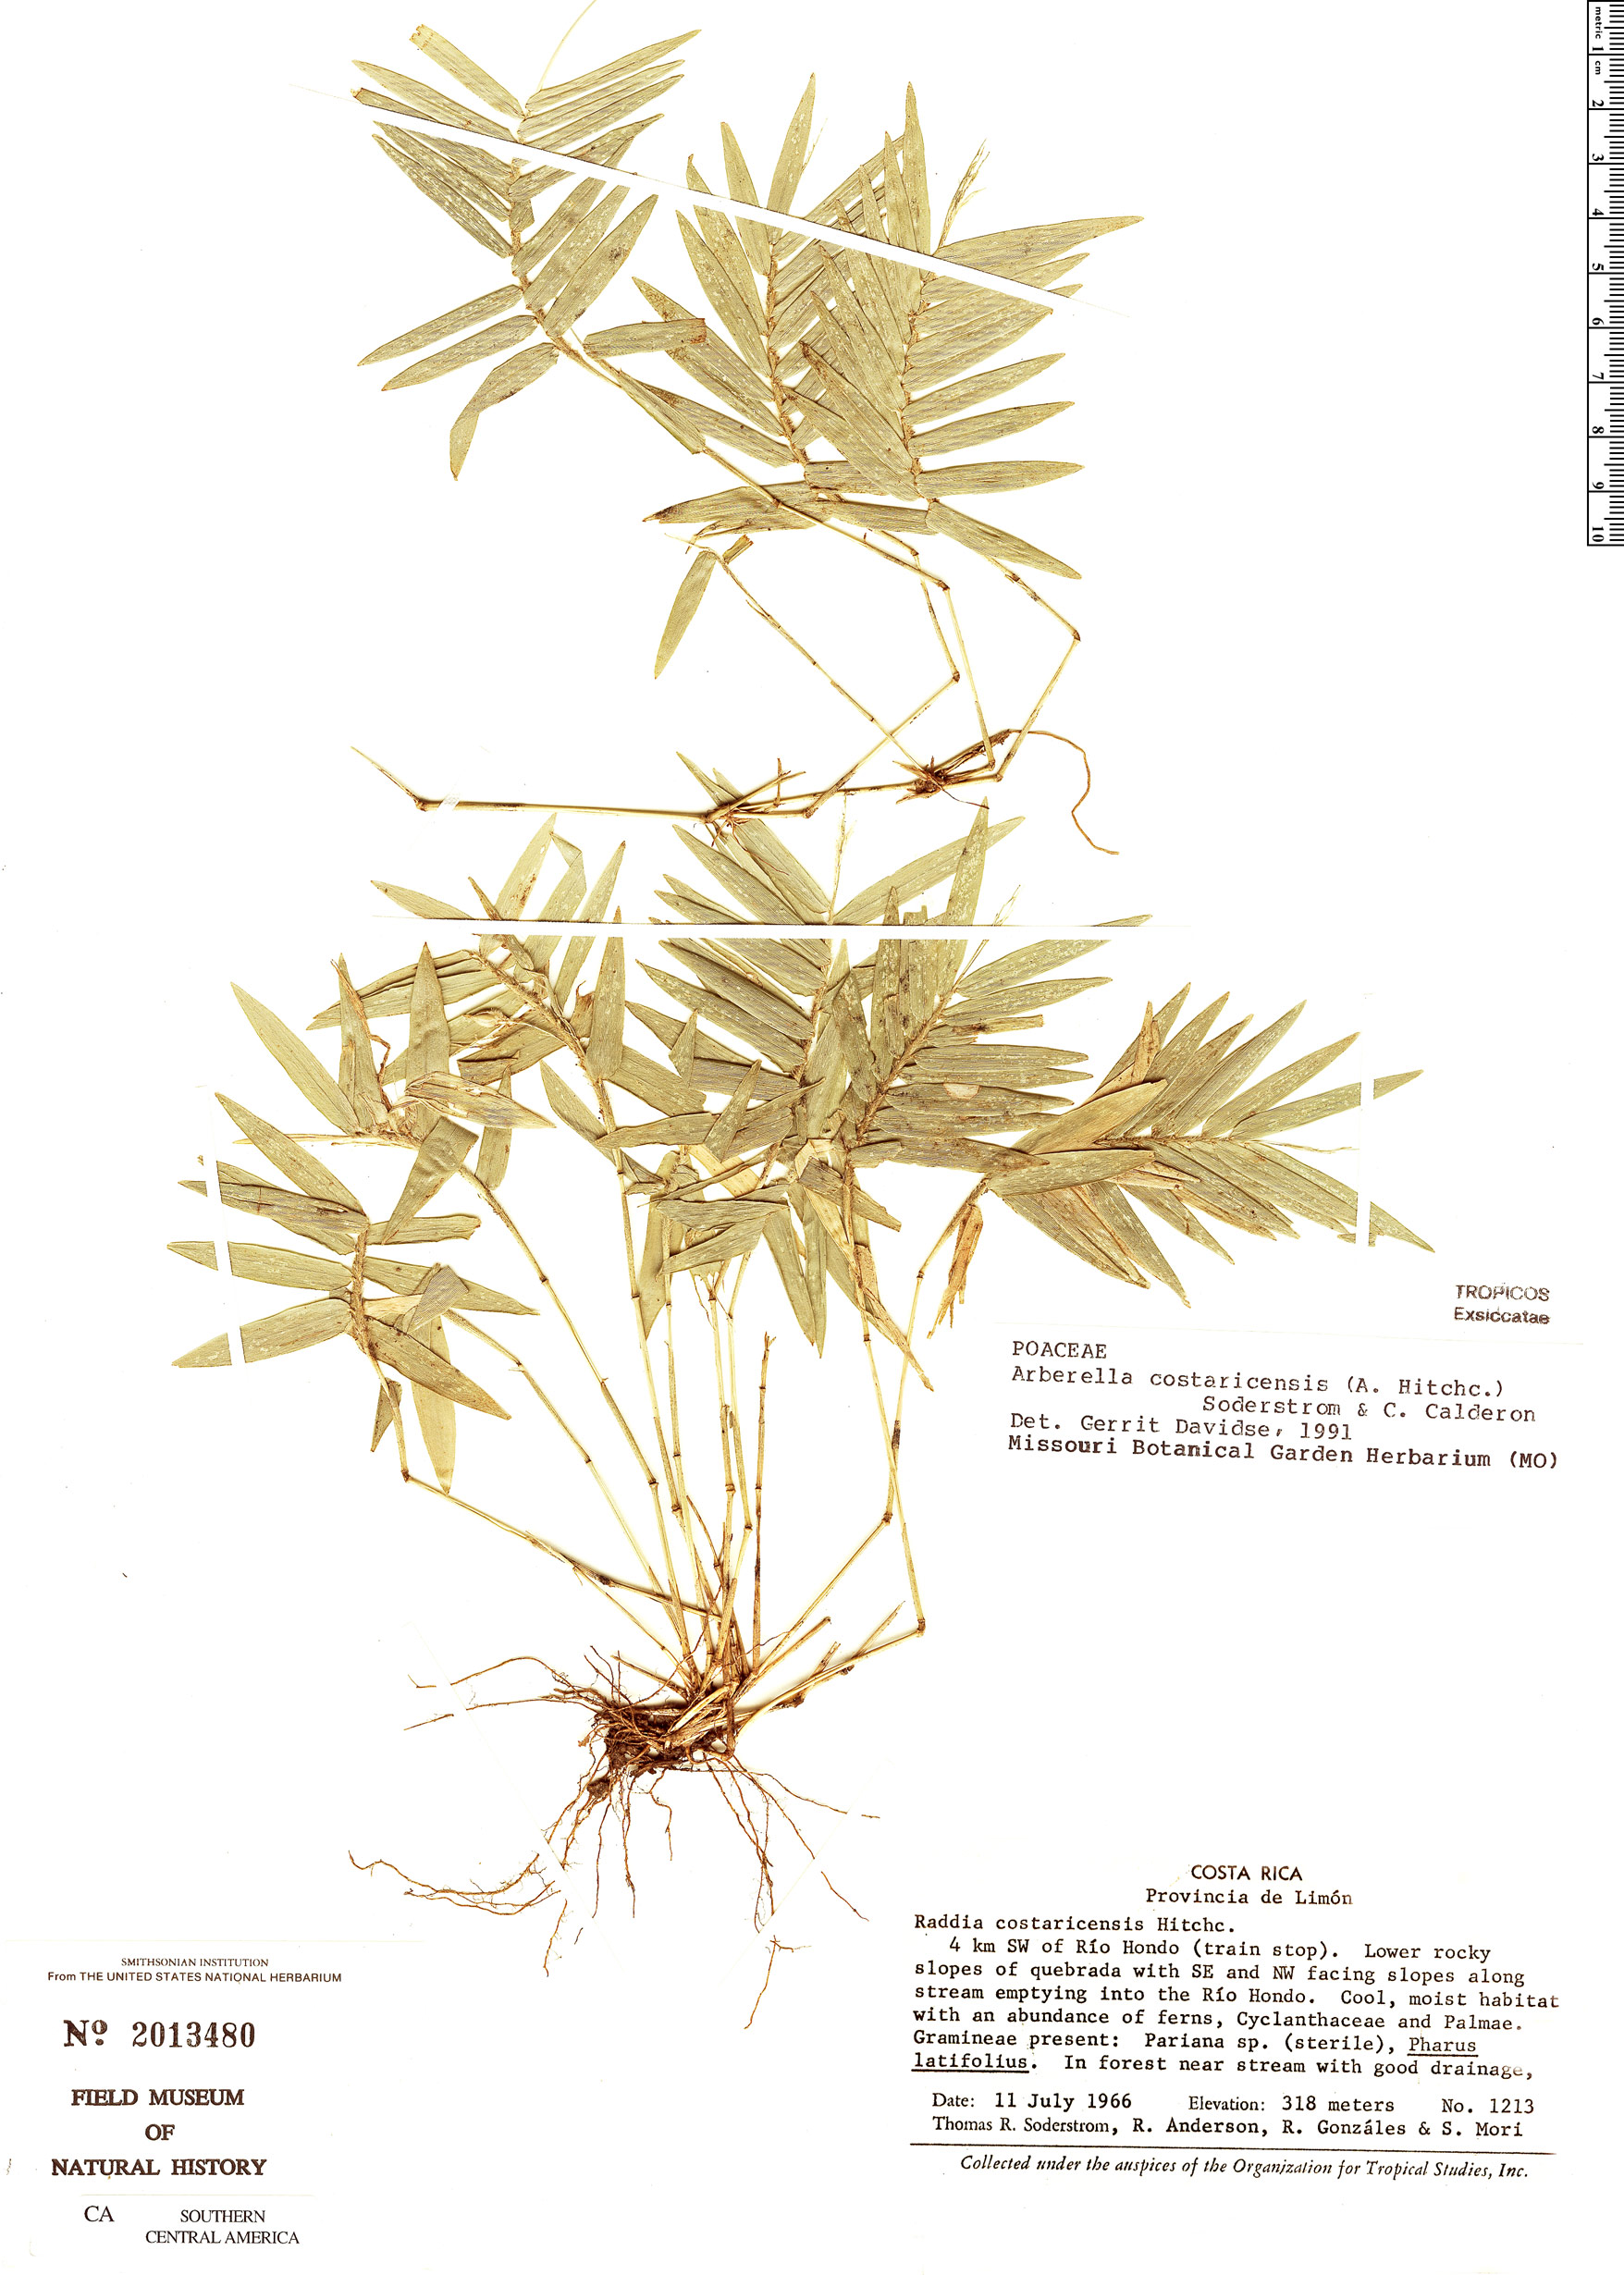 Image of Arberella costaricensis